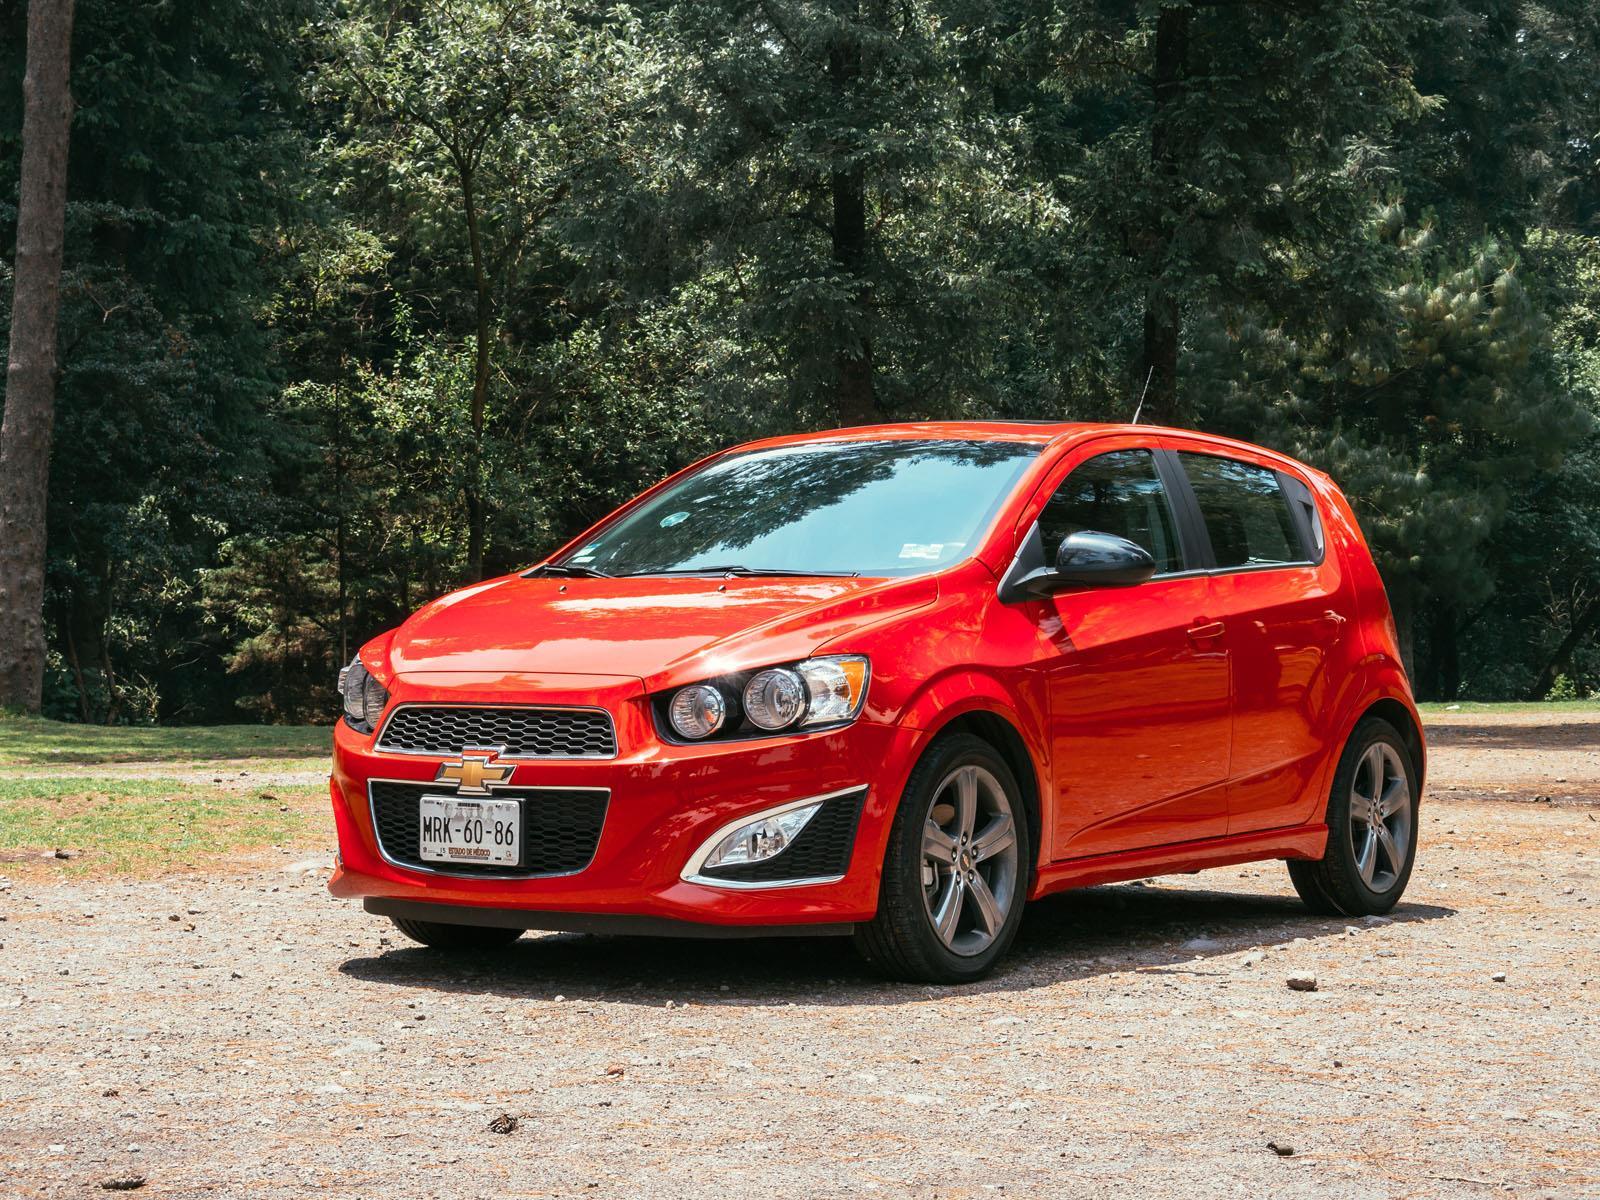 Chevrolet Sonic RS 2014 llega a México en $269,000 pesos - Autocosmos